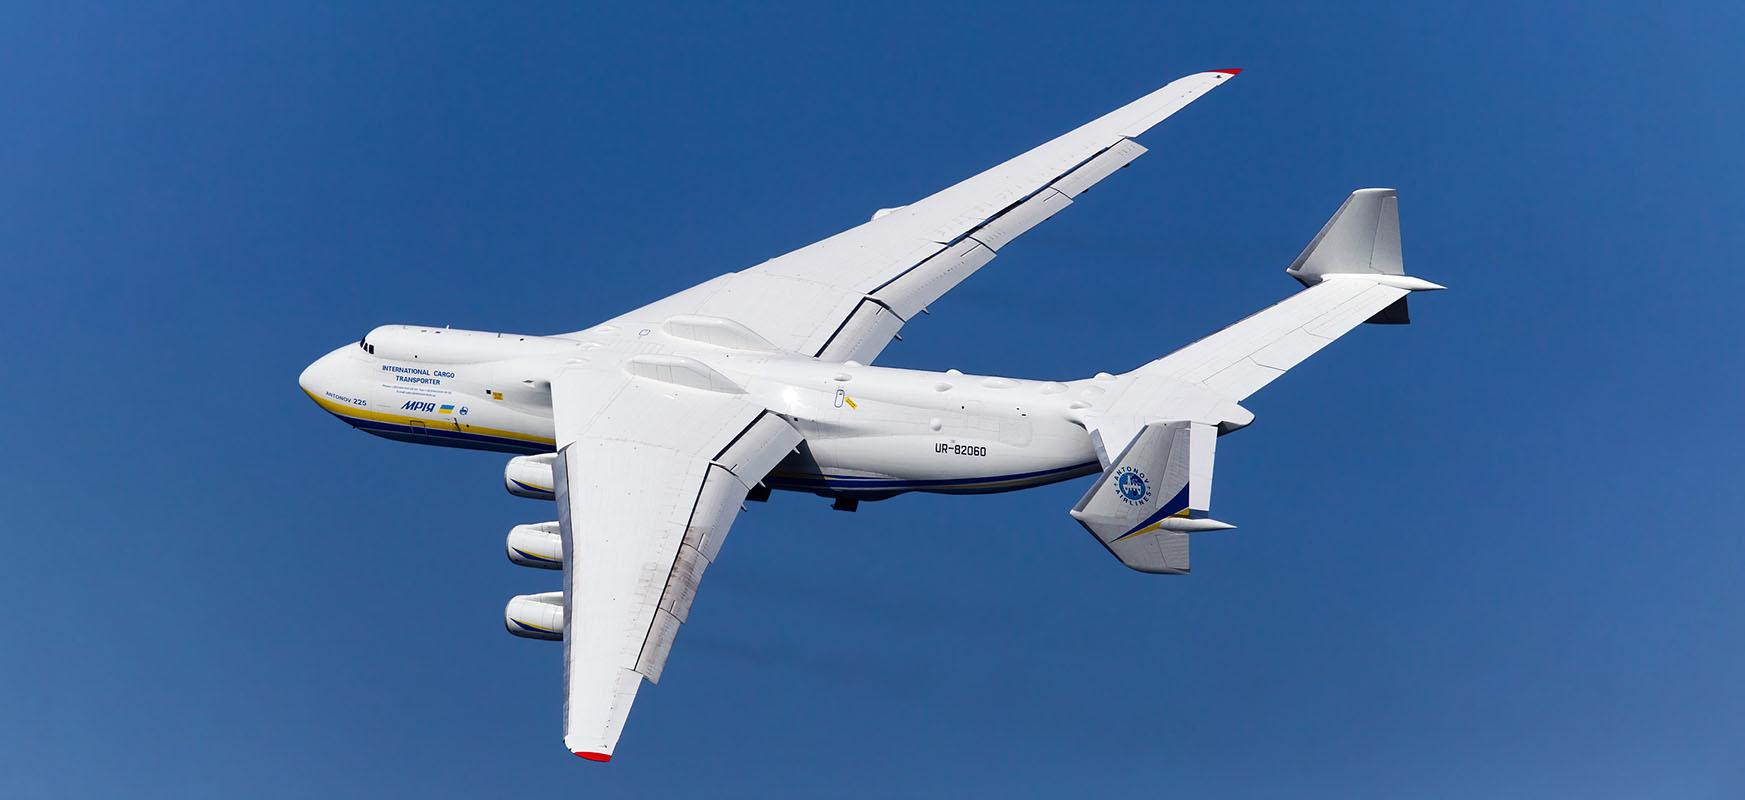 Antonov An-225 Mrija Handia Varsovian dago.  Ekipo medikoak taula gainean.  Ikusi linean